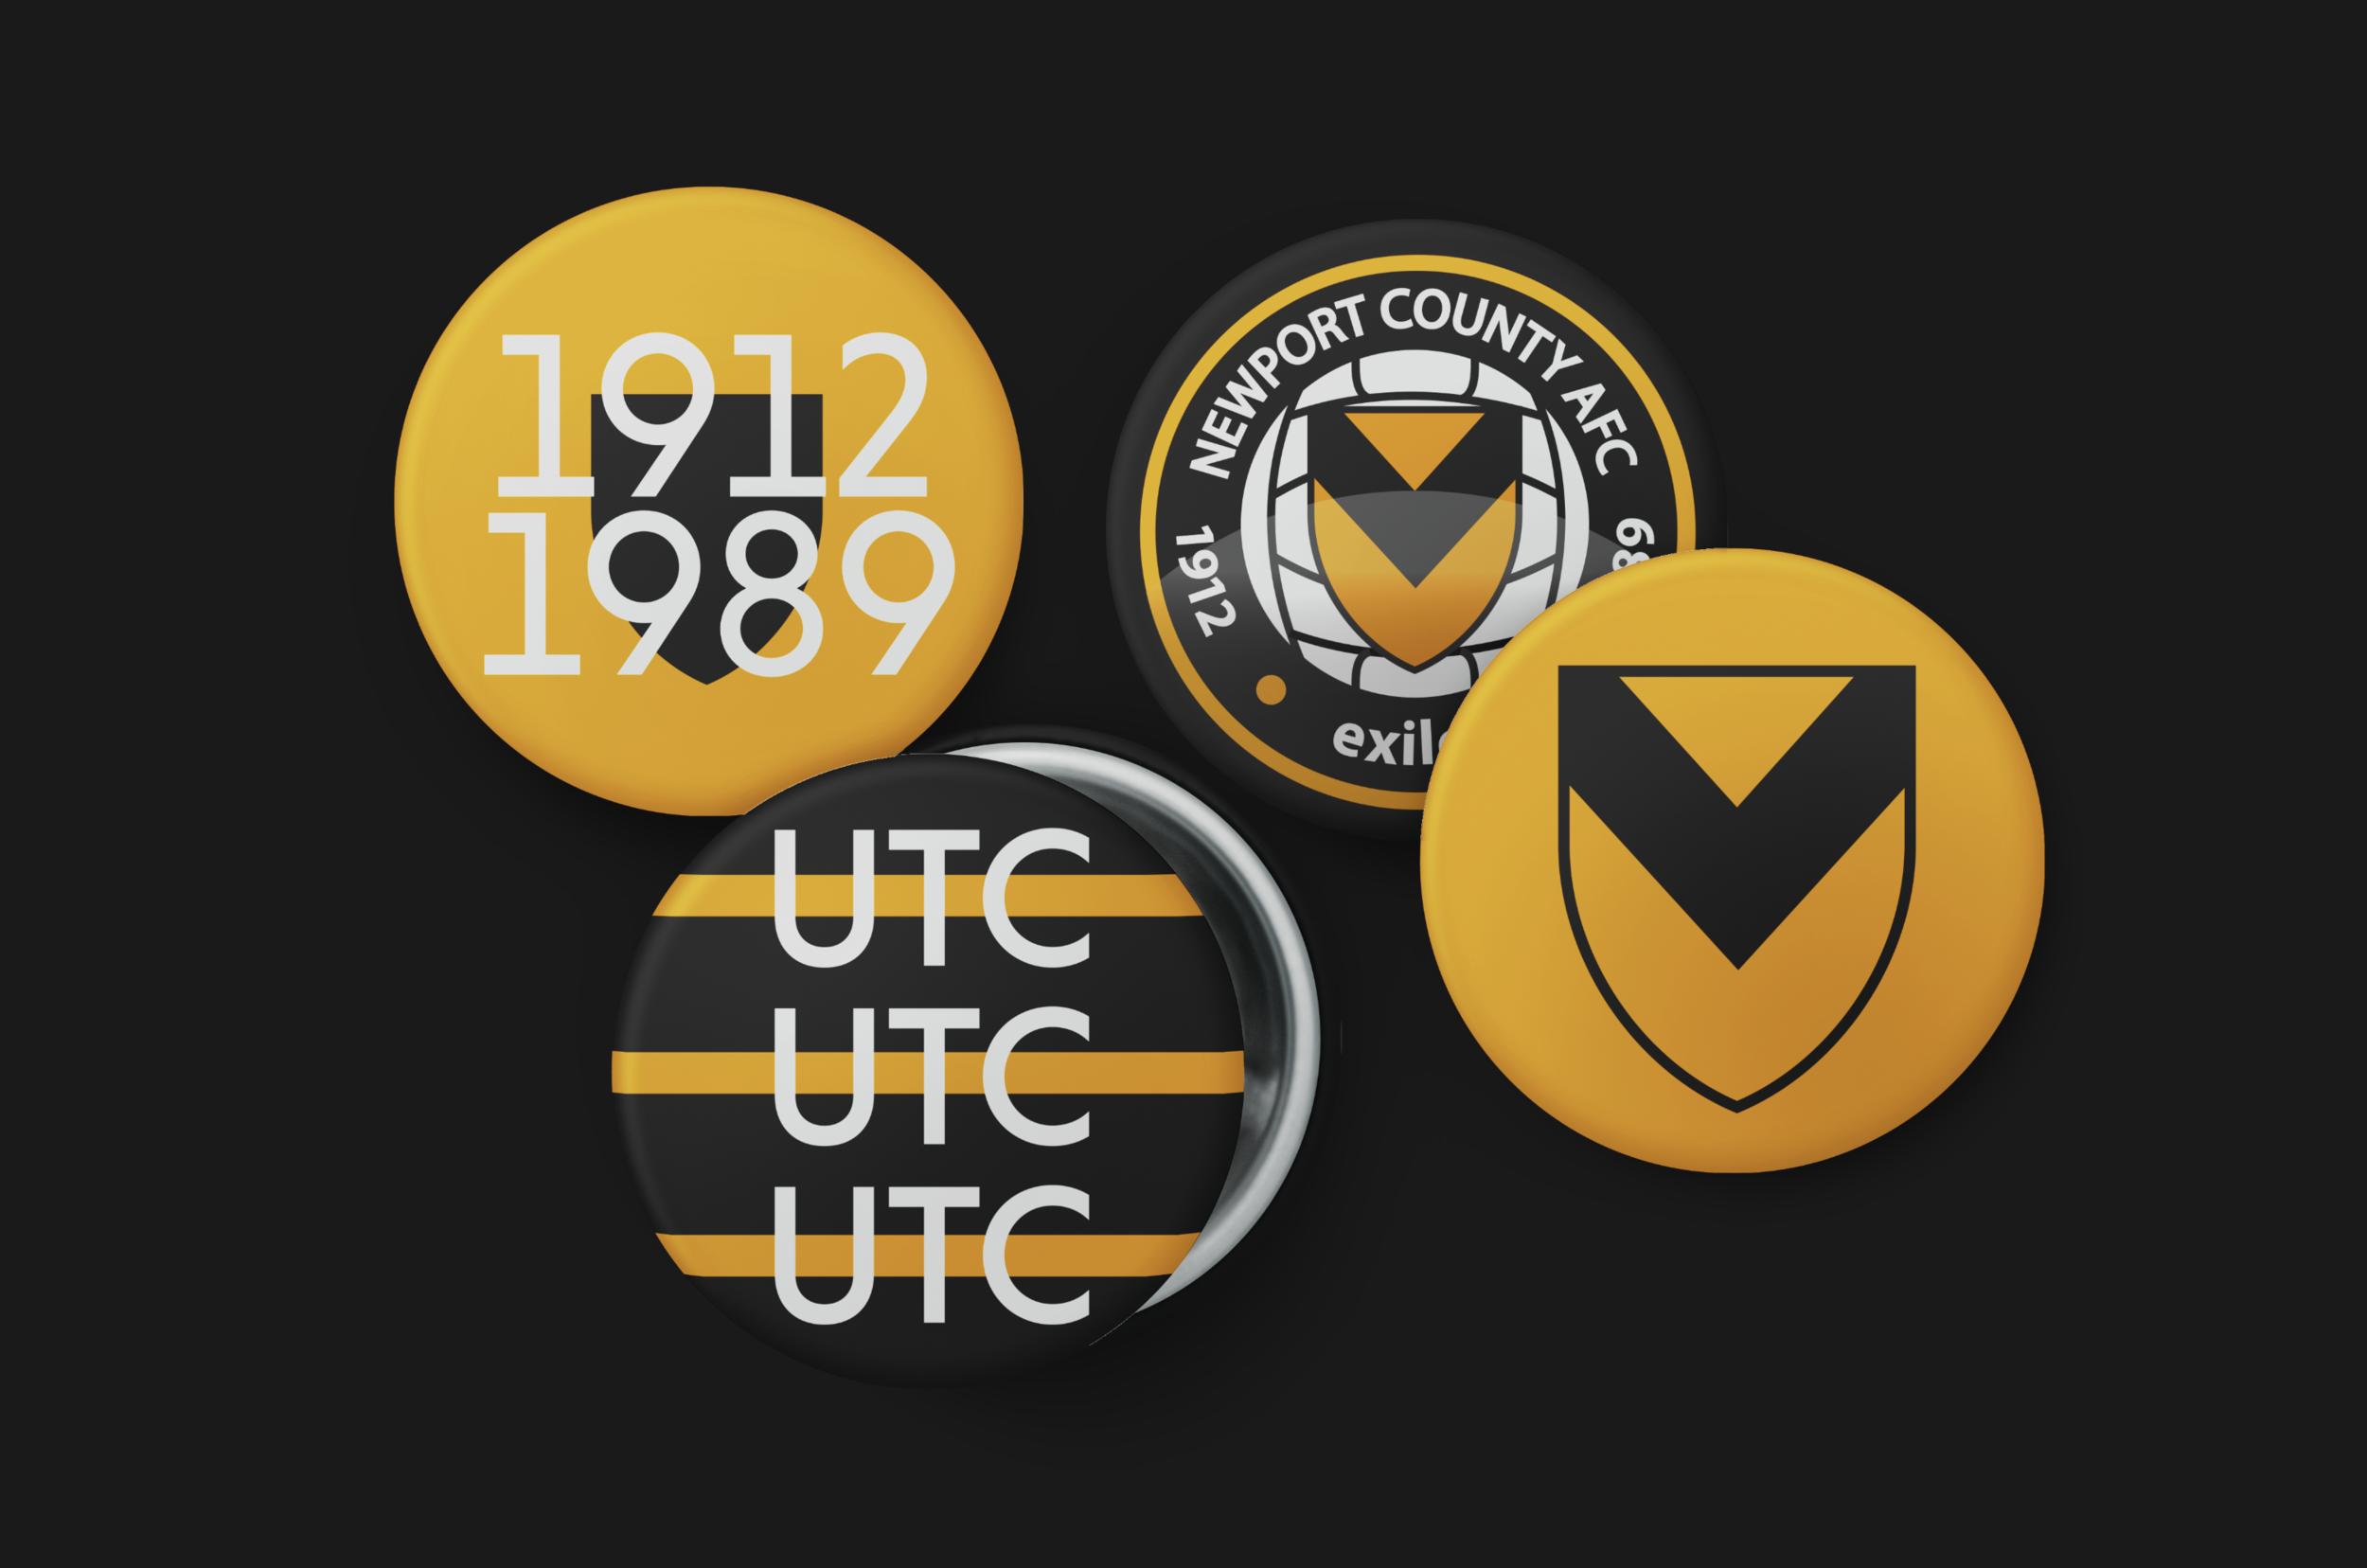 ncfc-badges.png